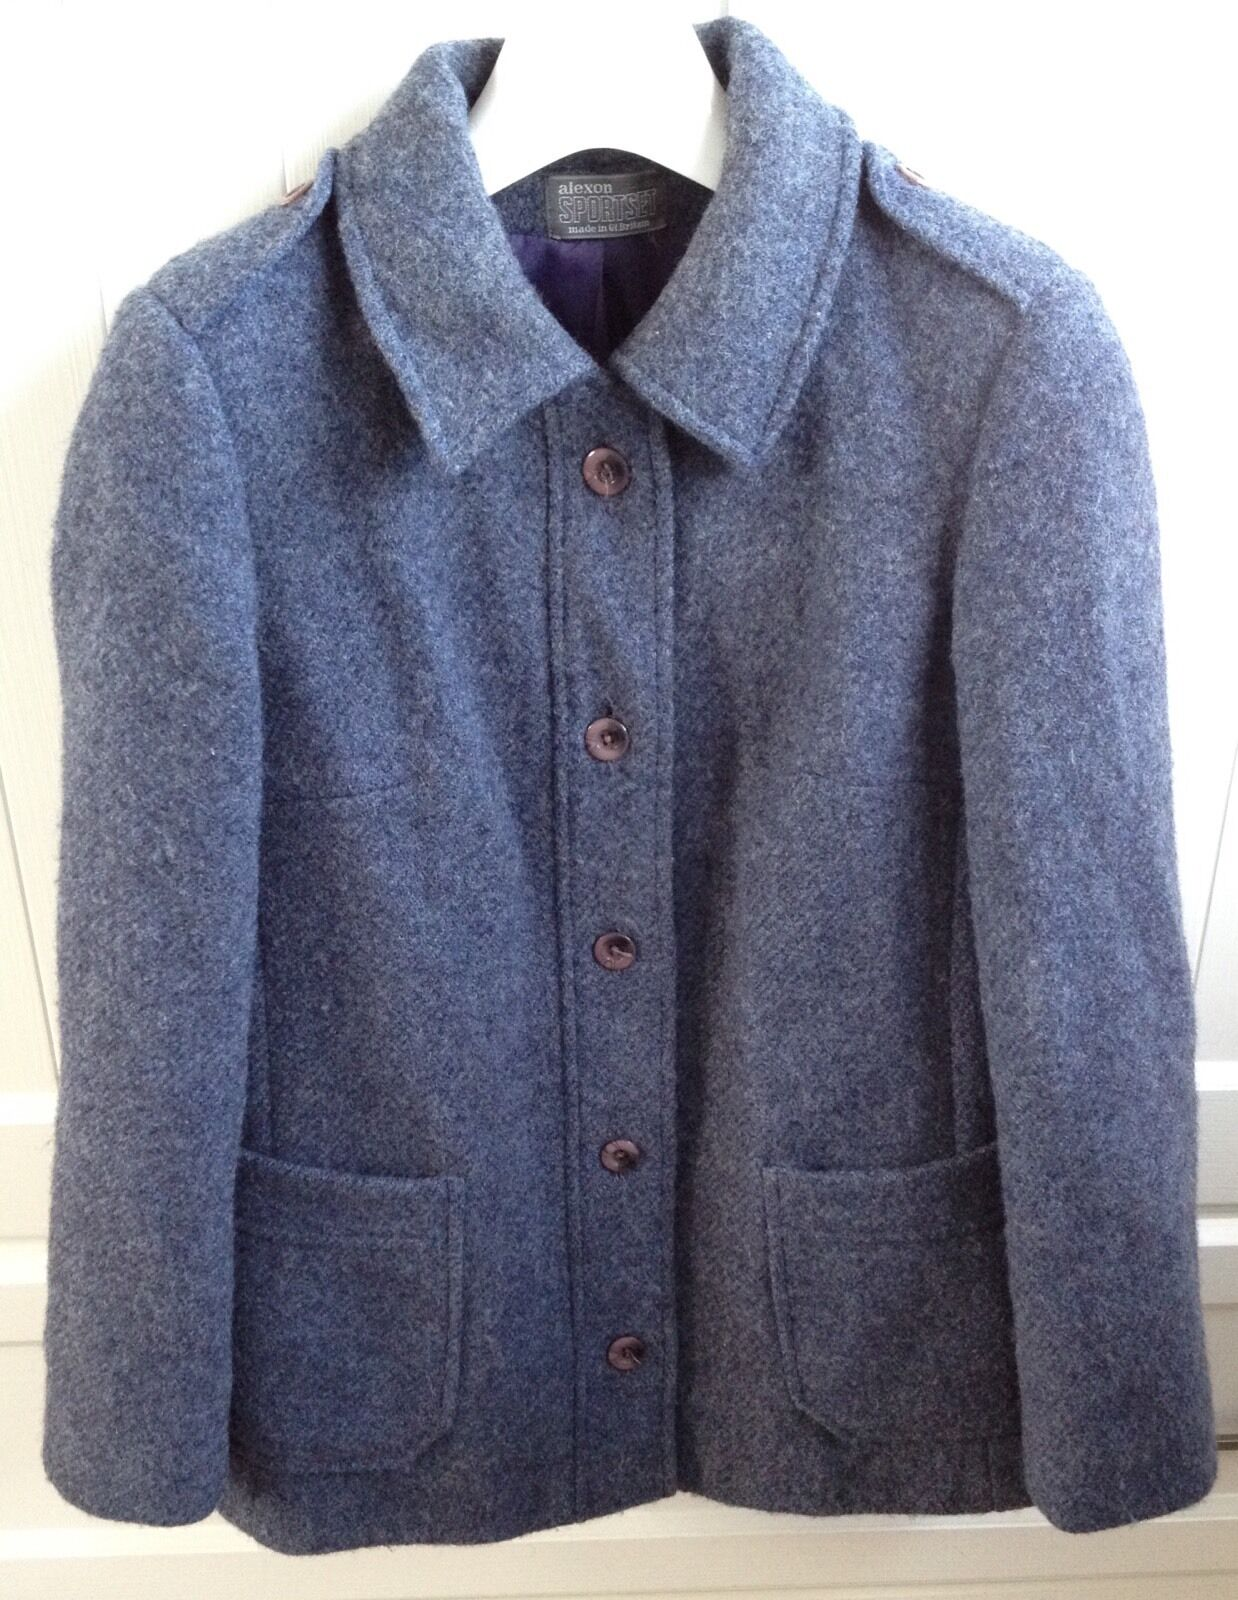 Vintage Alexon Sportset bluee Pure New Wool Blazer Blazer Blazer Long Sleeve Blouse 38  Chest 248861